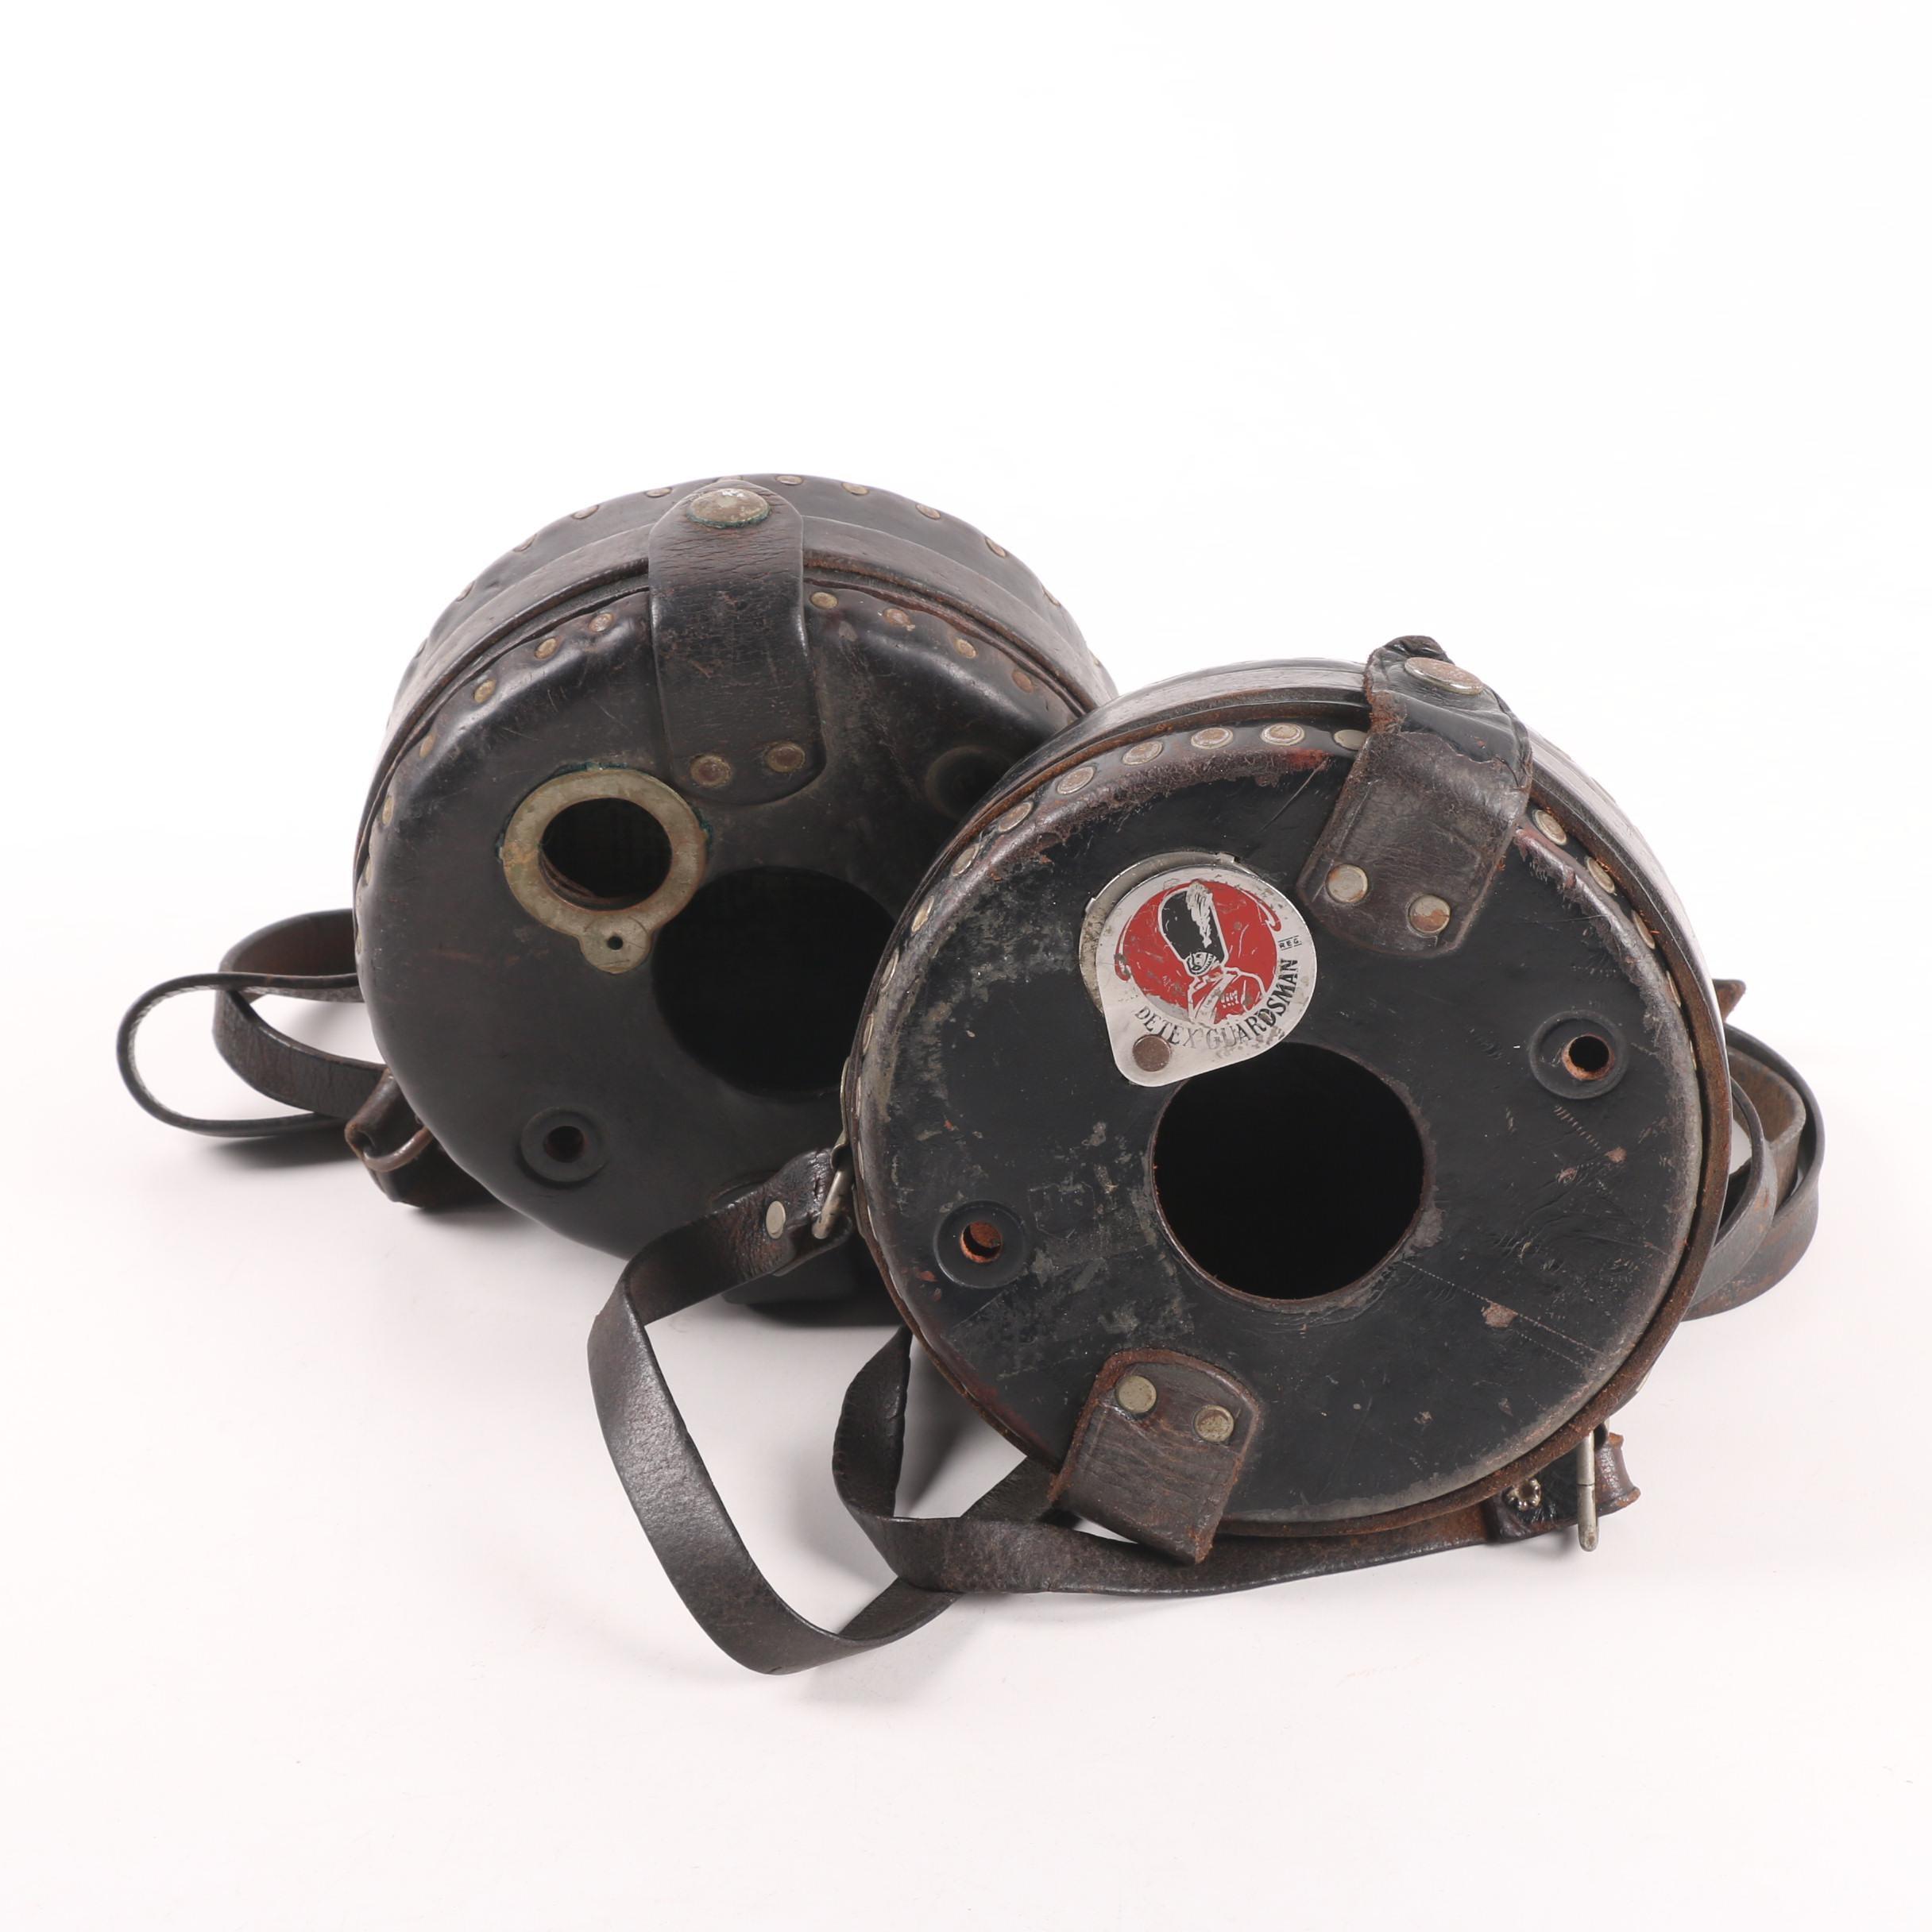 Detex Guardsman Watchclock Leather Cases